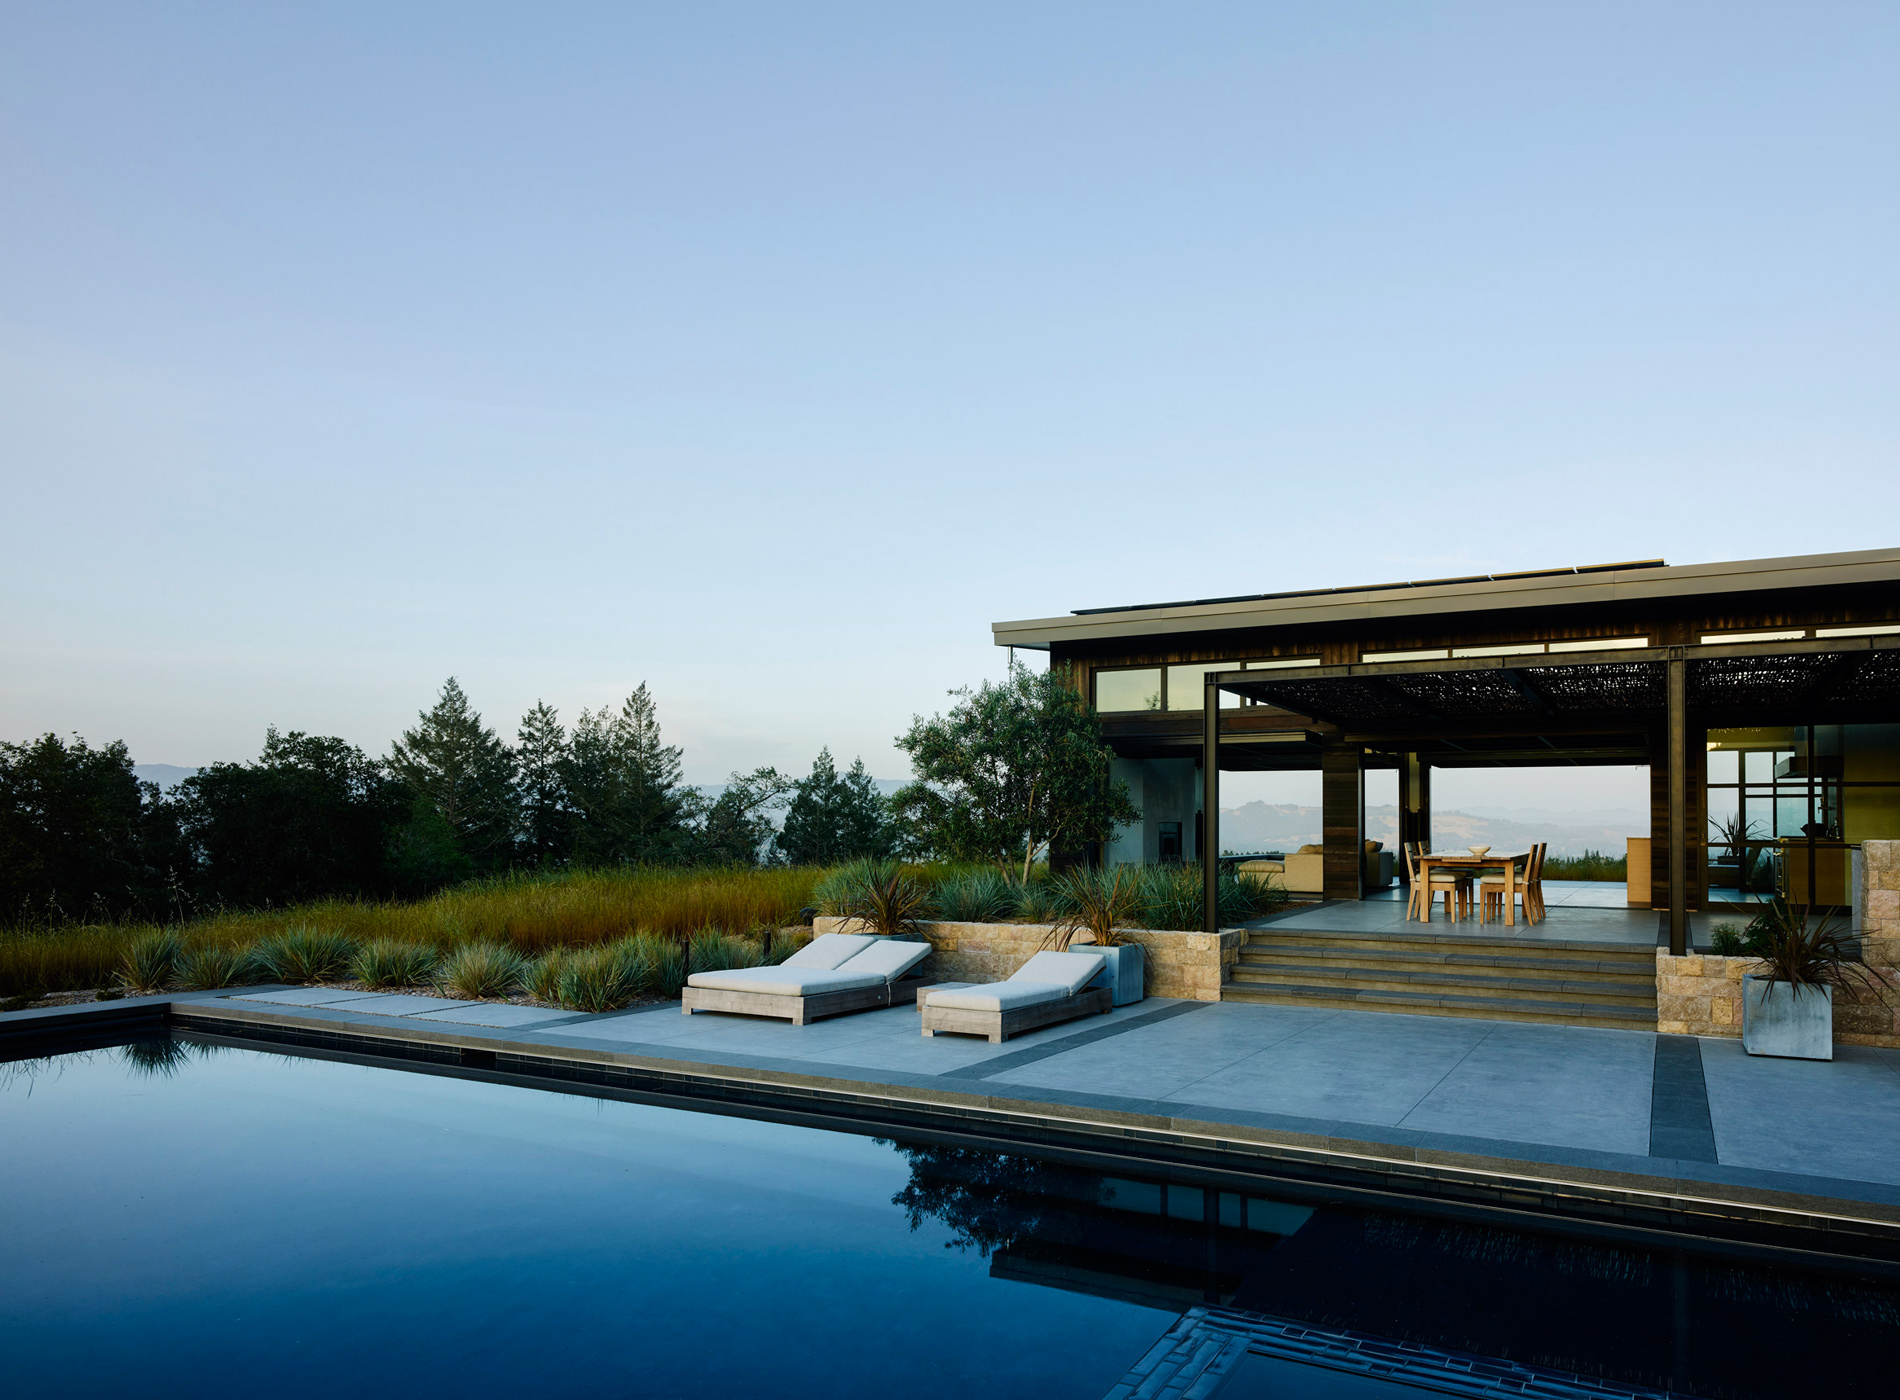 Healdsburg House Sonoma Californie Architecture Terrasse Piscine